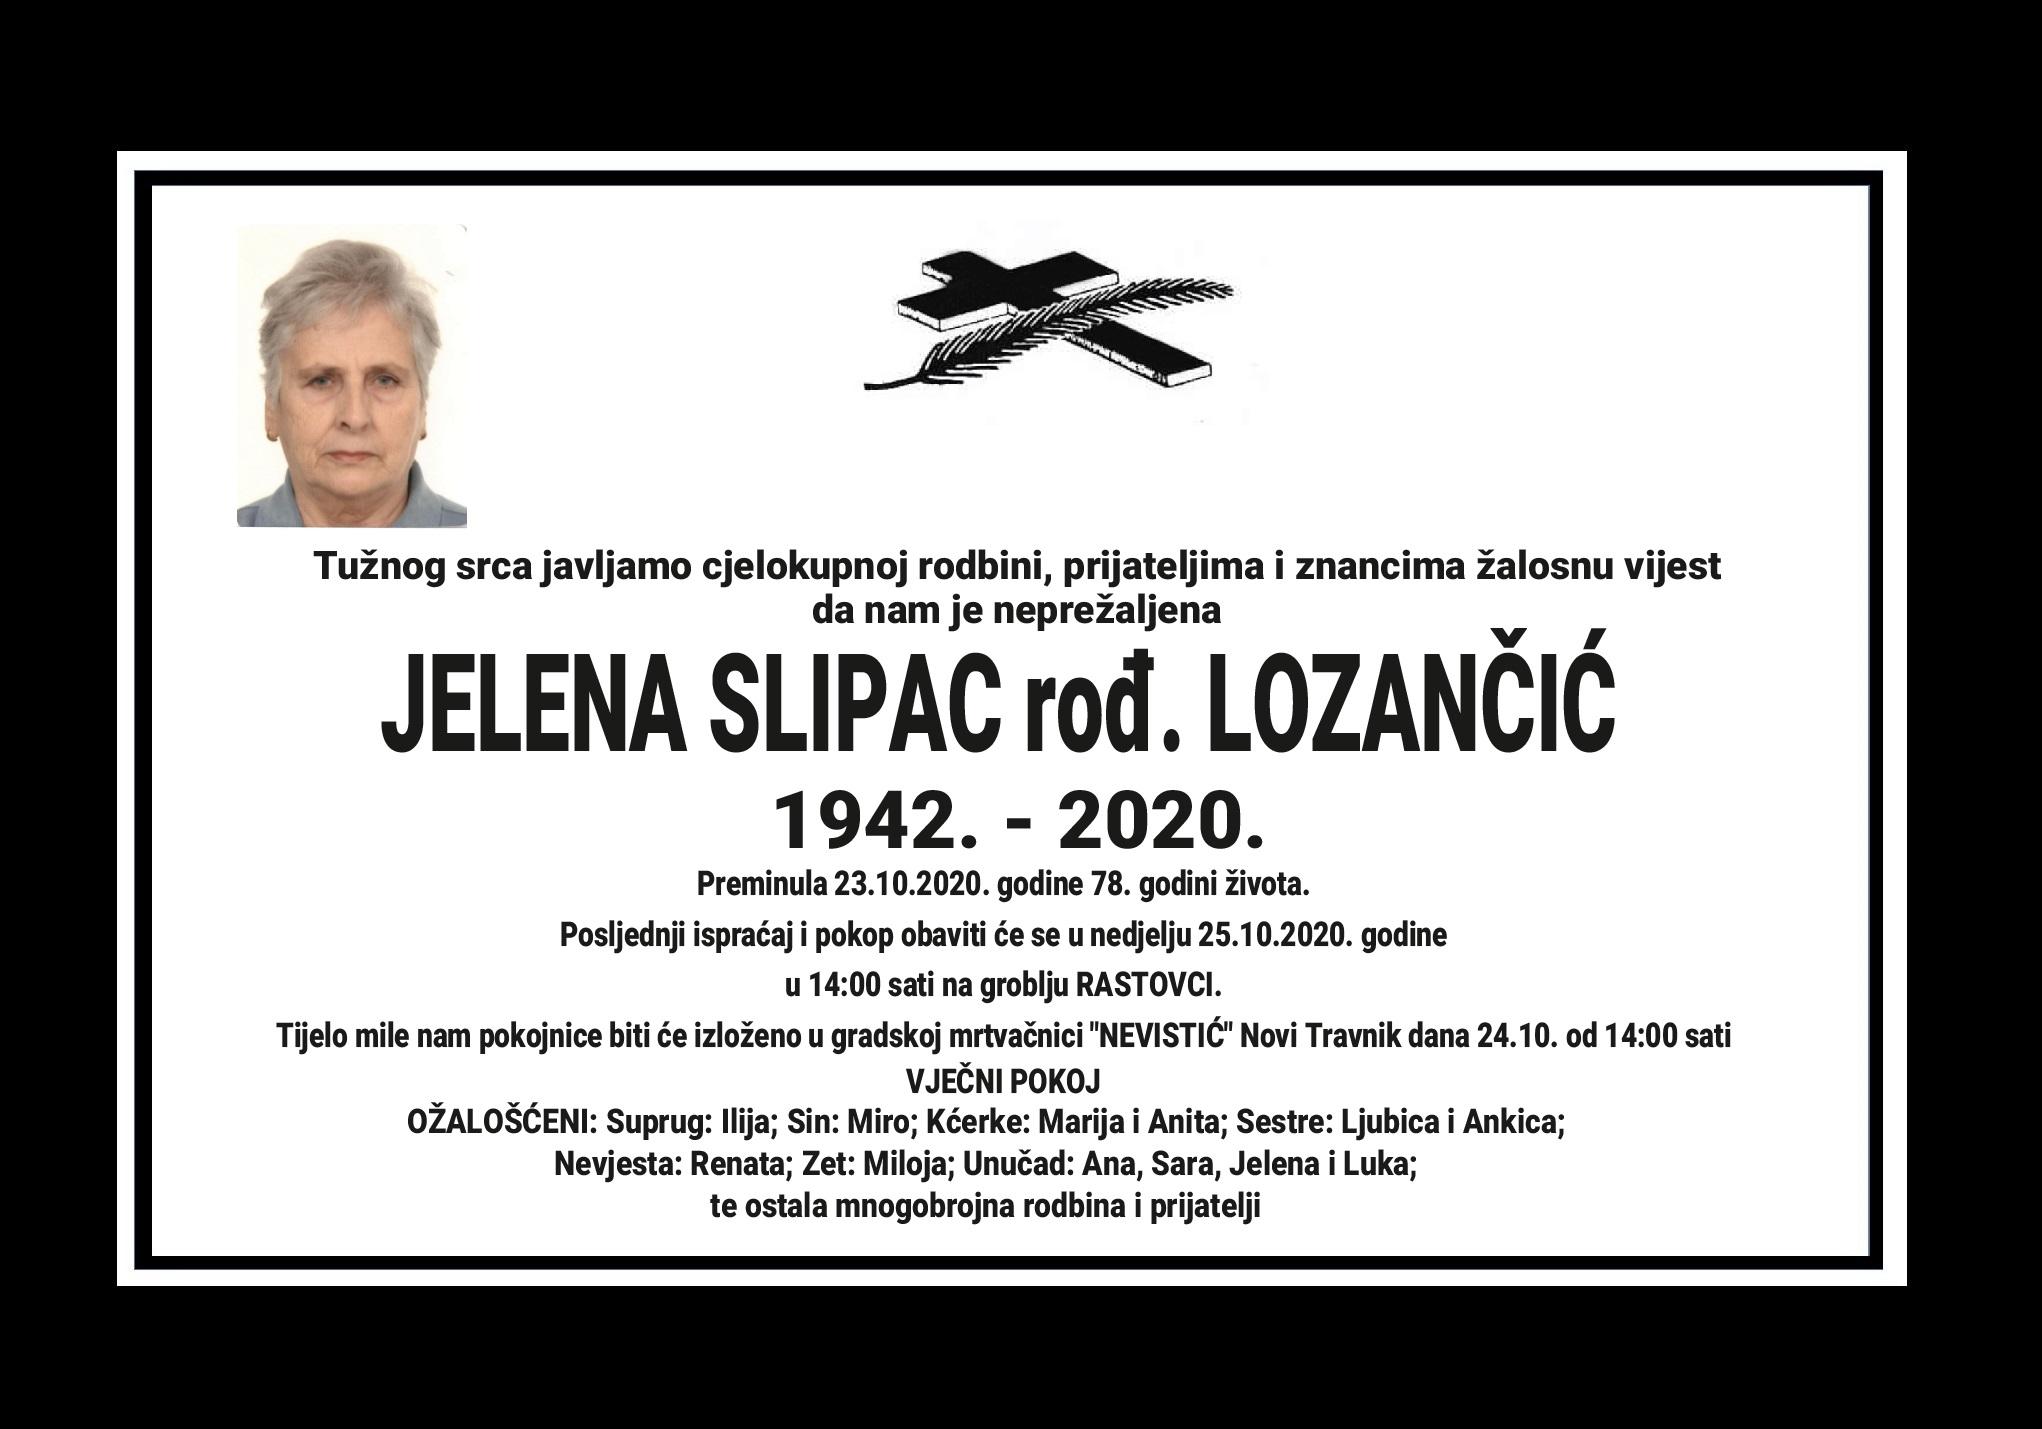 Jelena Slipac rođ. Lozančić